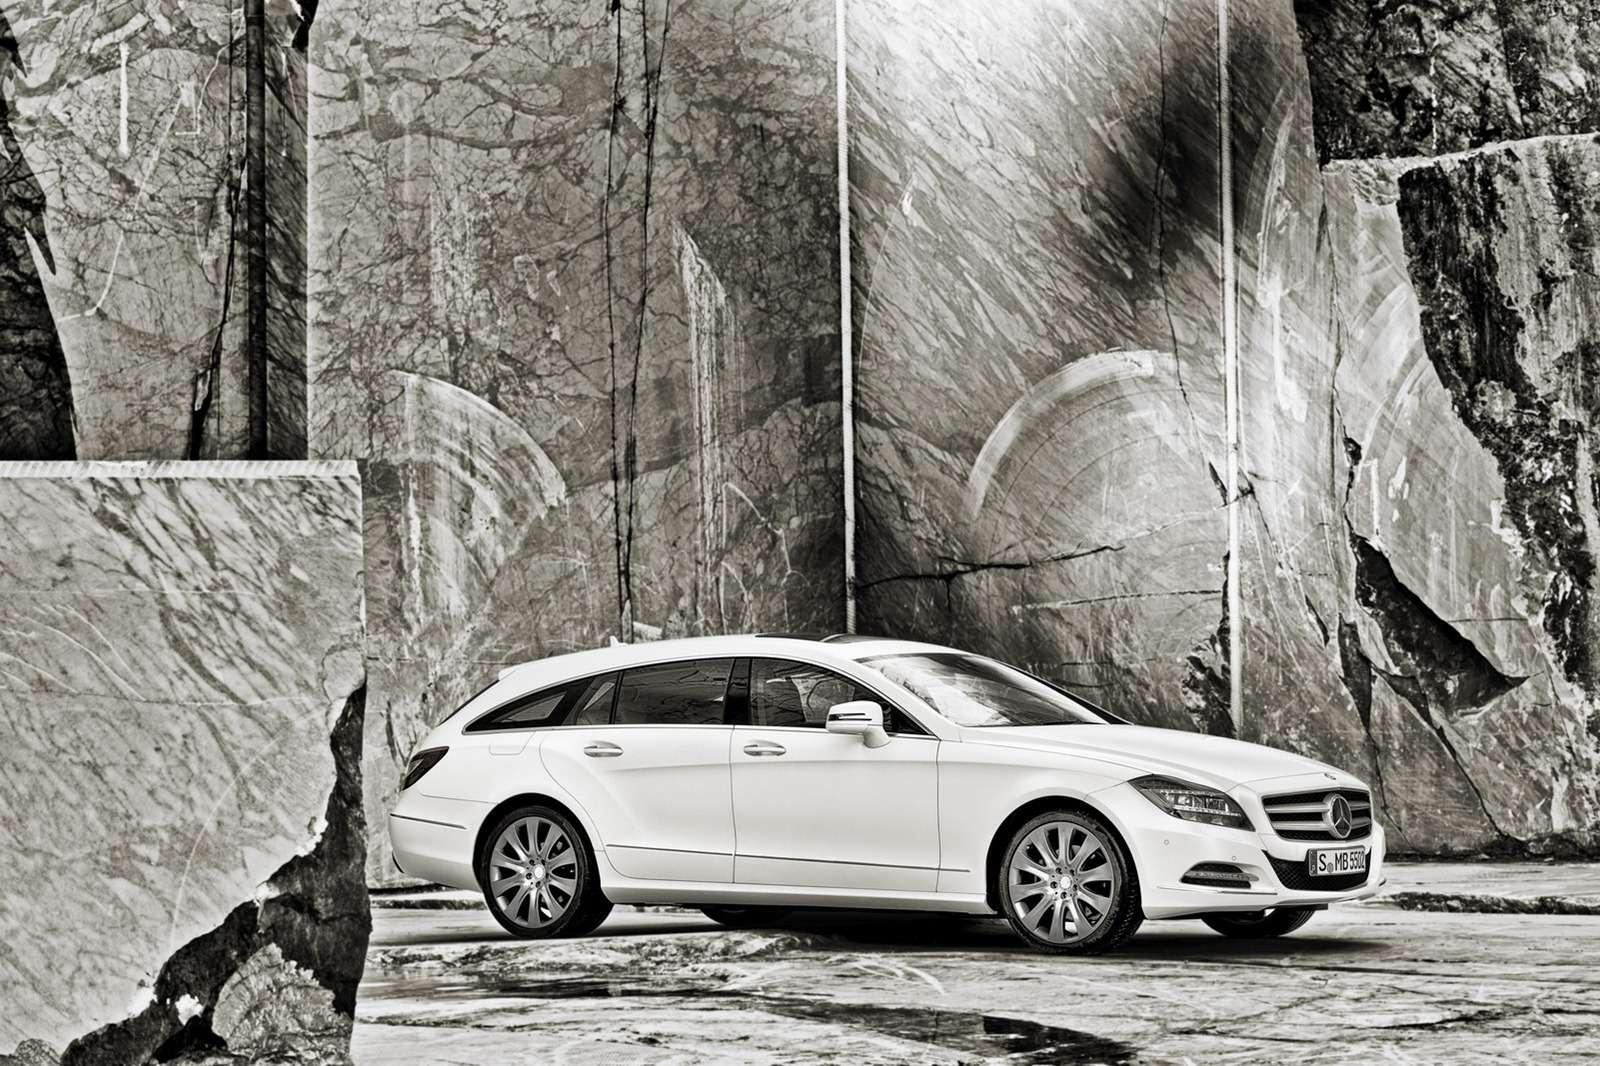 Mercedes CLS Shooting Brake 2013